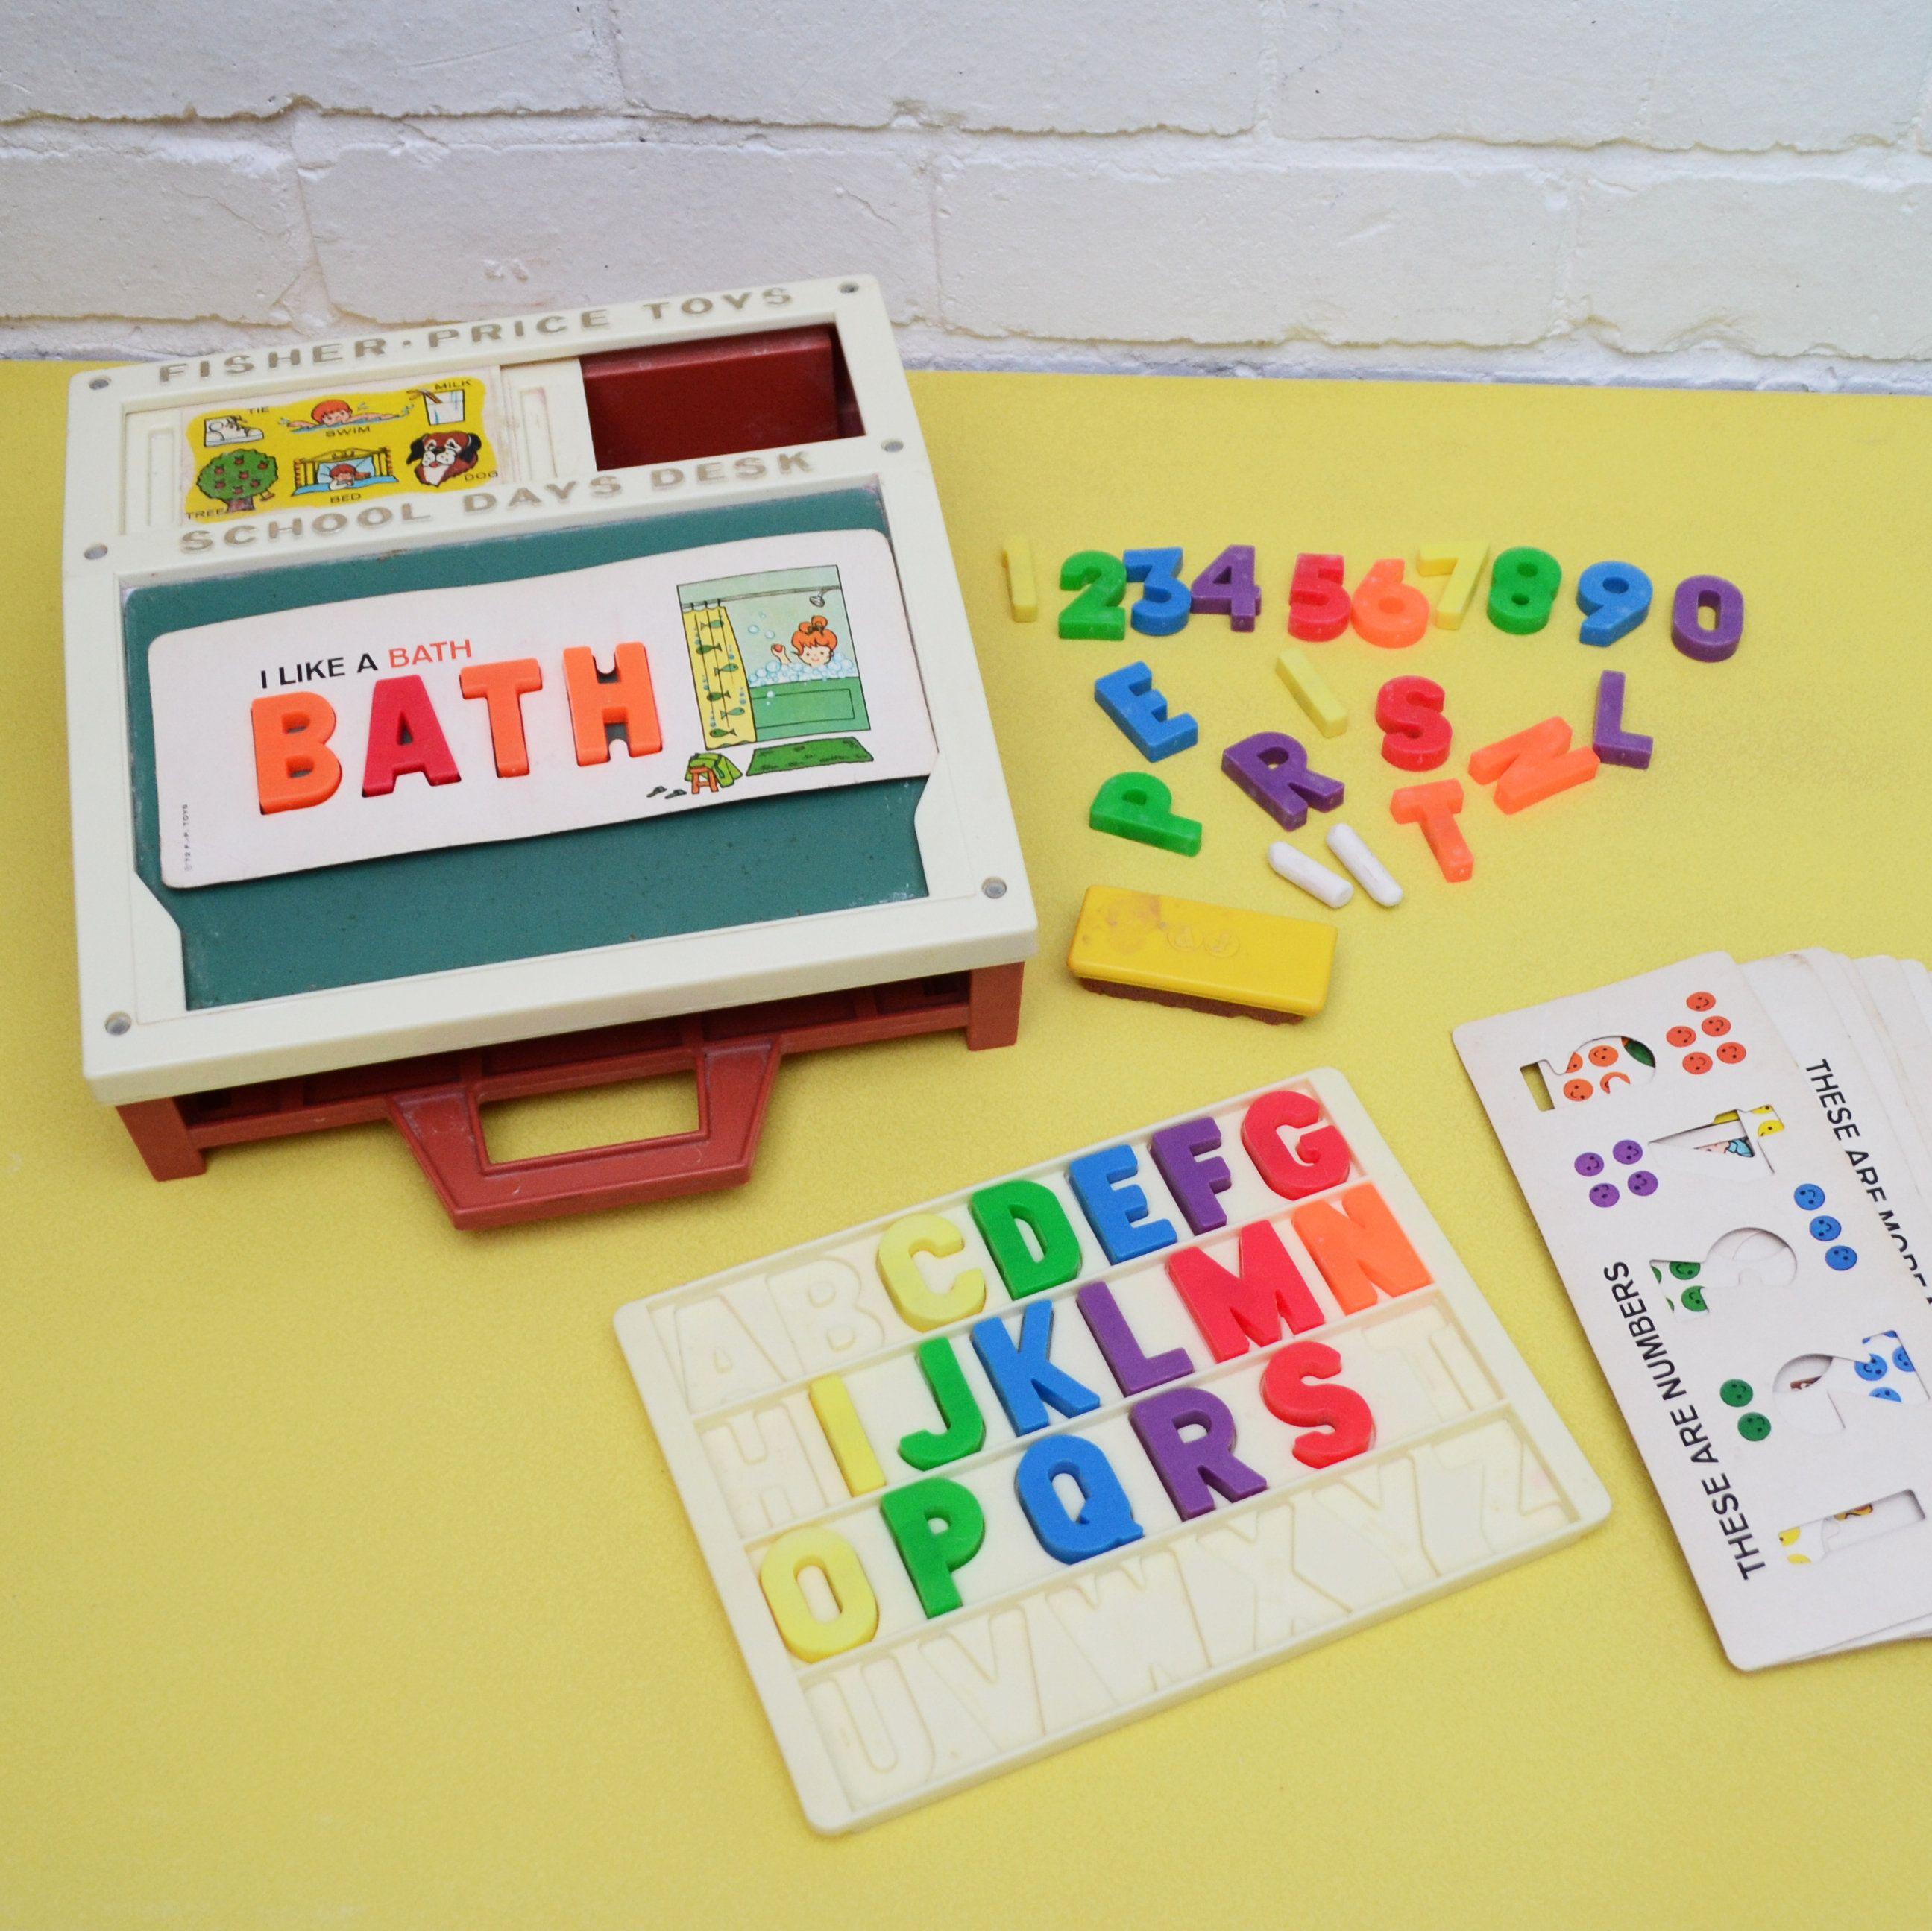 Vintage Fisher Price Play Desk Children S Spelling Toy Retro Fisher Price Desk Chalkboard Toy Education Vintage Fisher Price Activity Toys Educational Toys